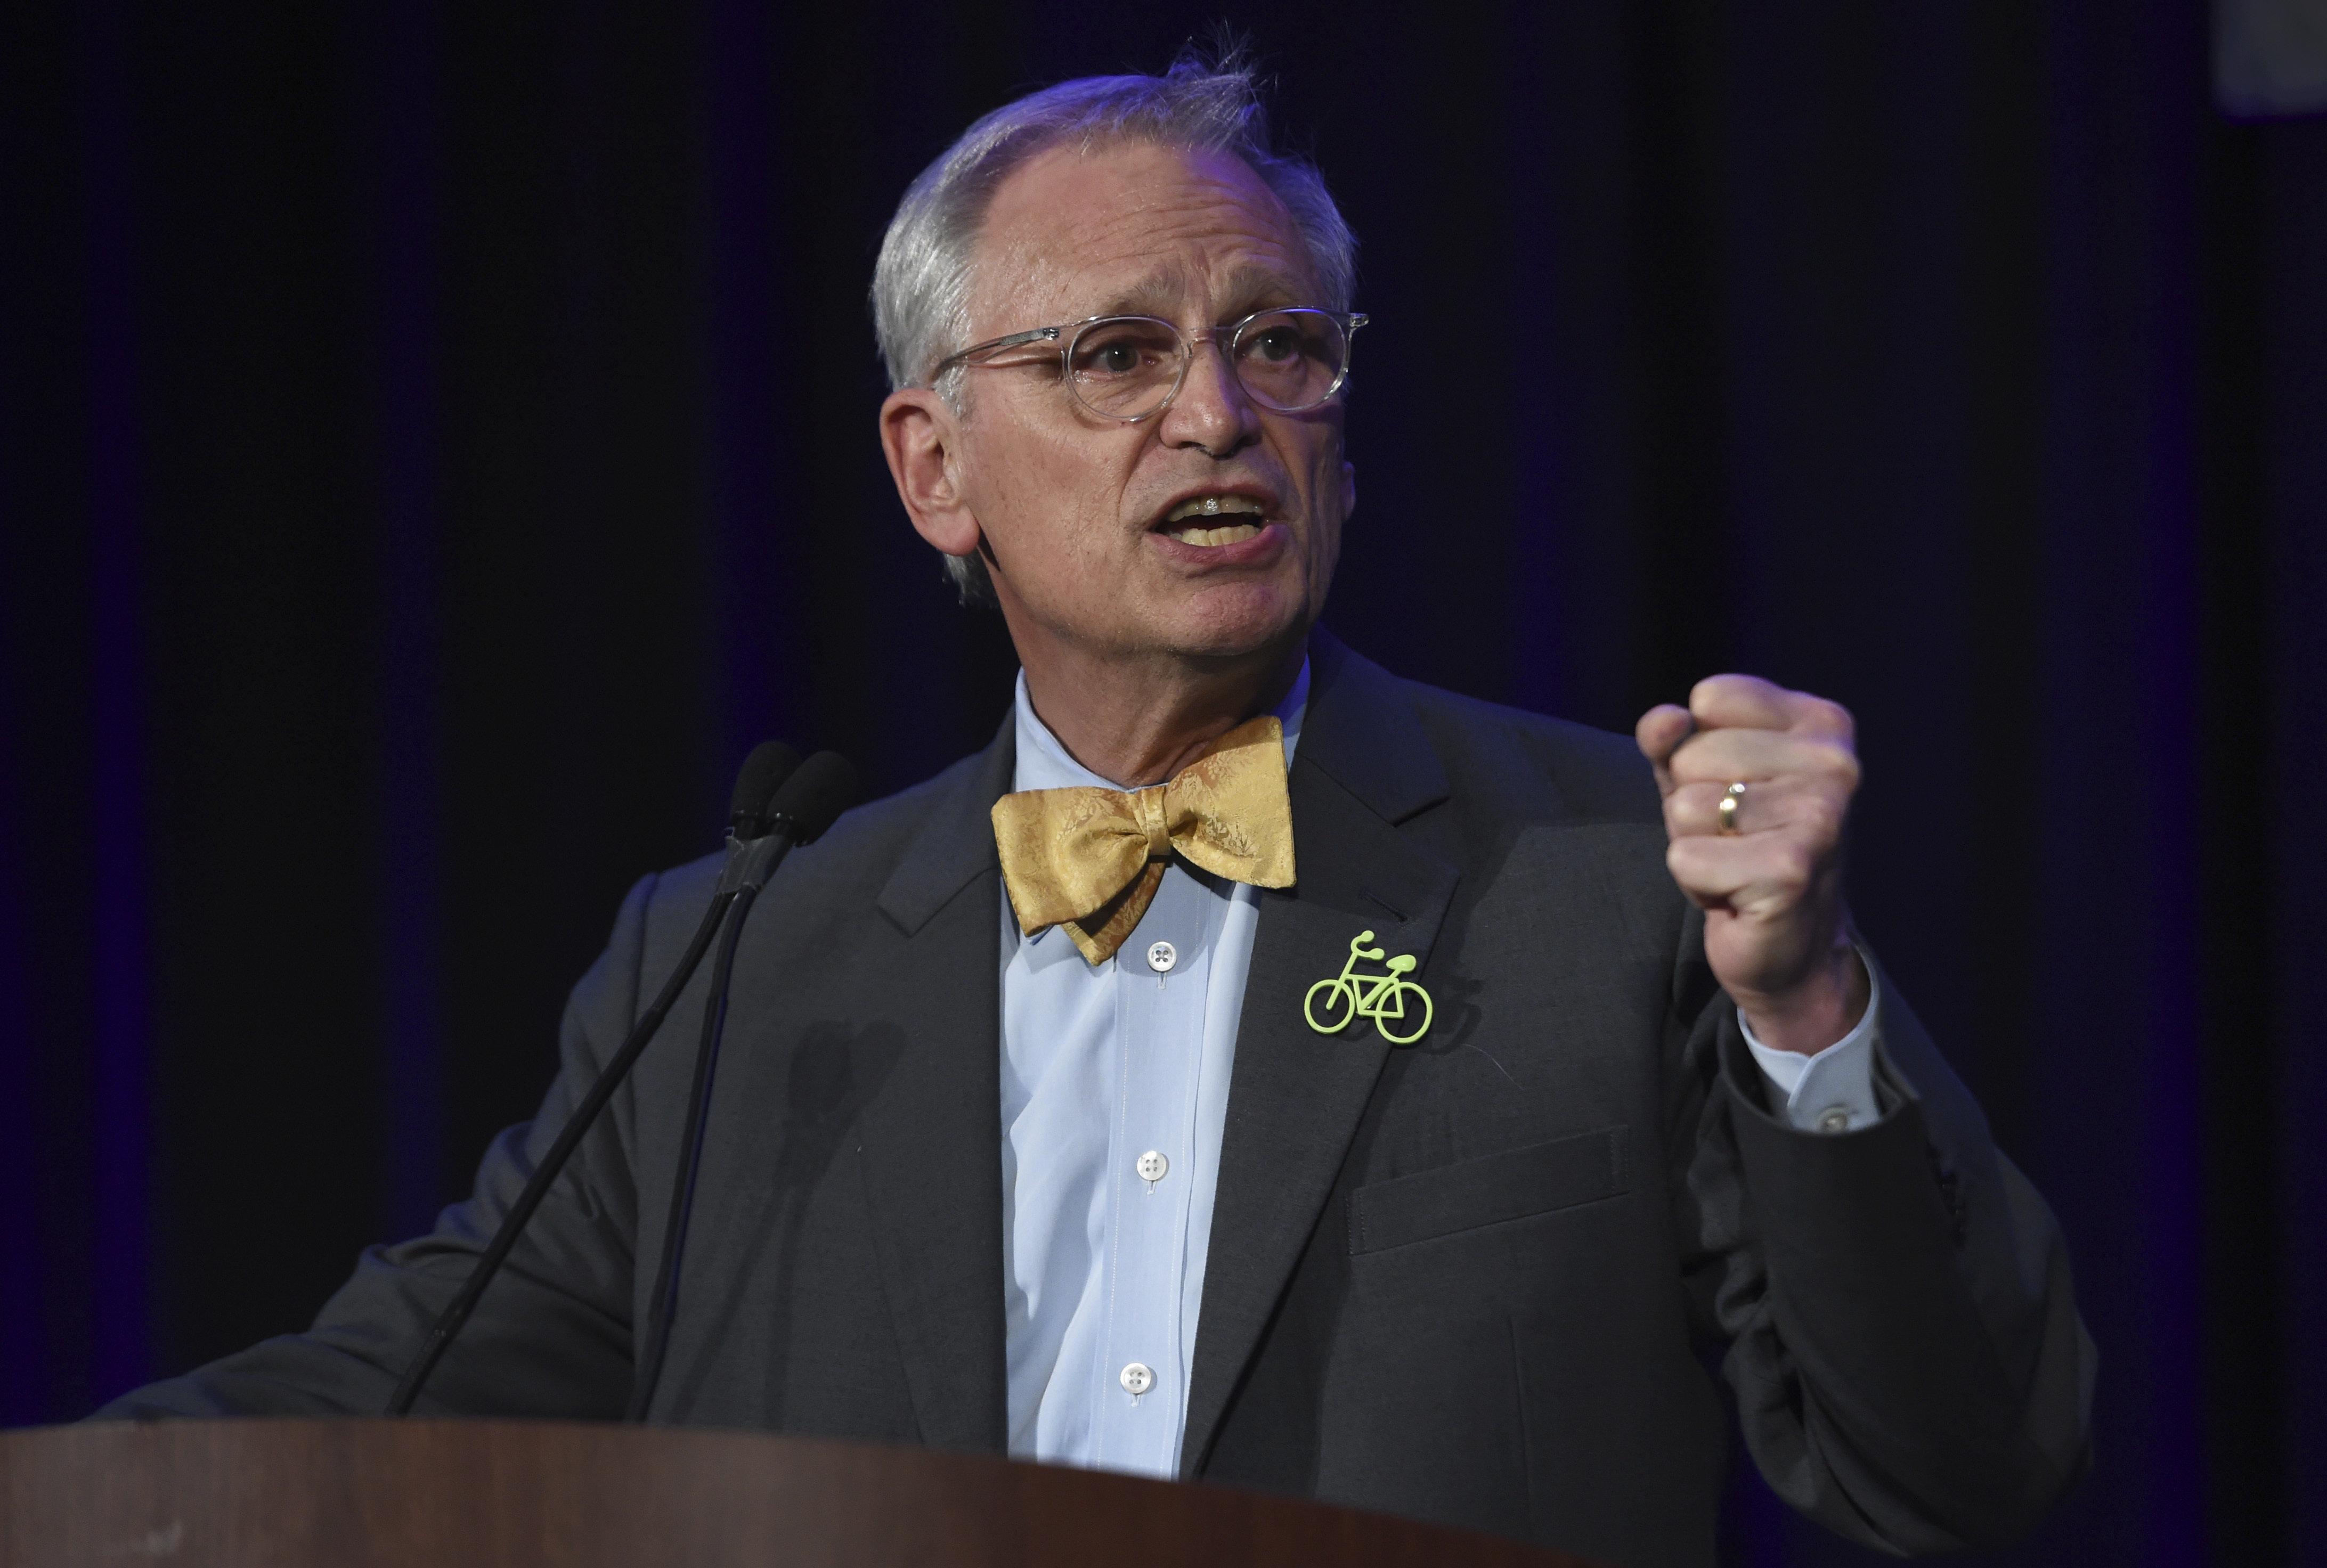 Congressman Earl Blumenauer speaks during election night in Portland, Ore., Tuesday, Nov. 6, 2018. (AP Photo/Steve Dykes)